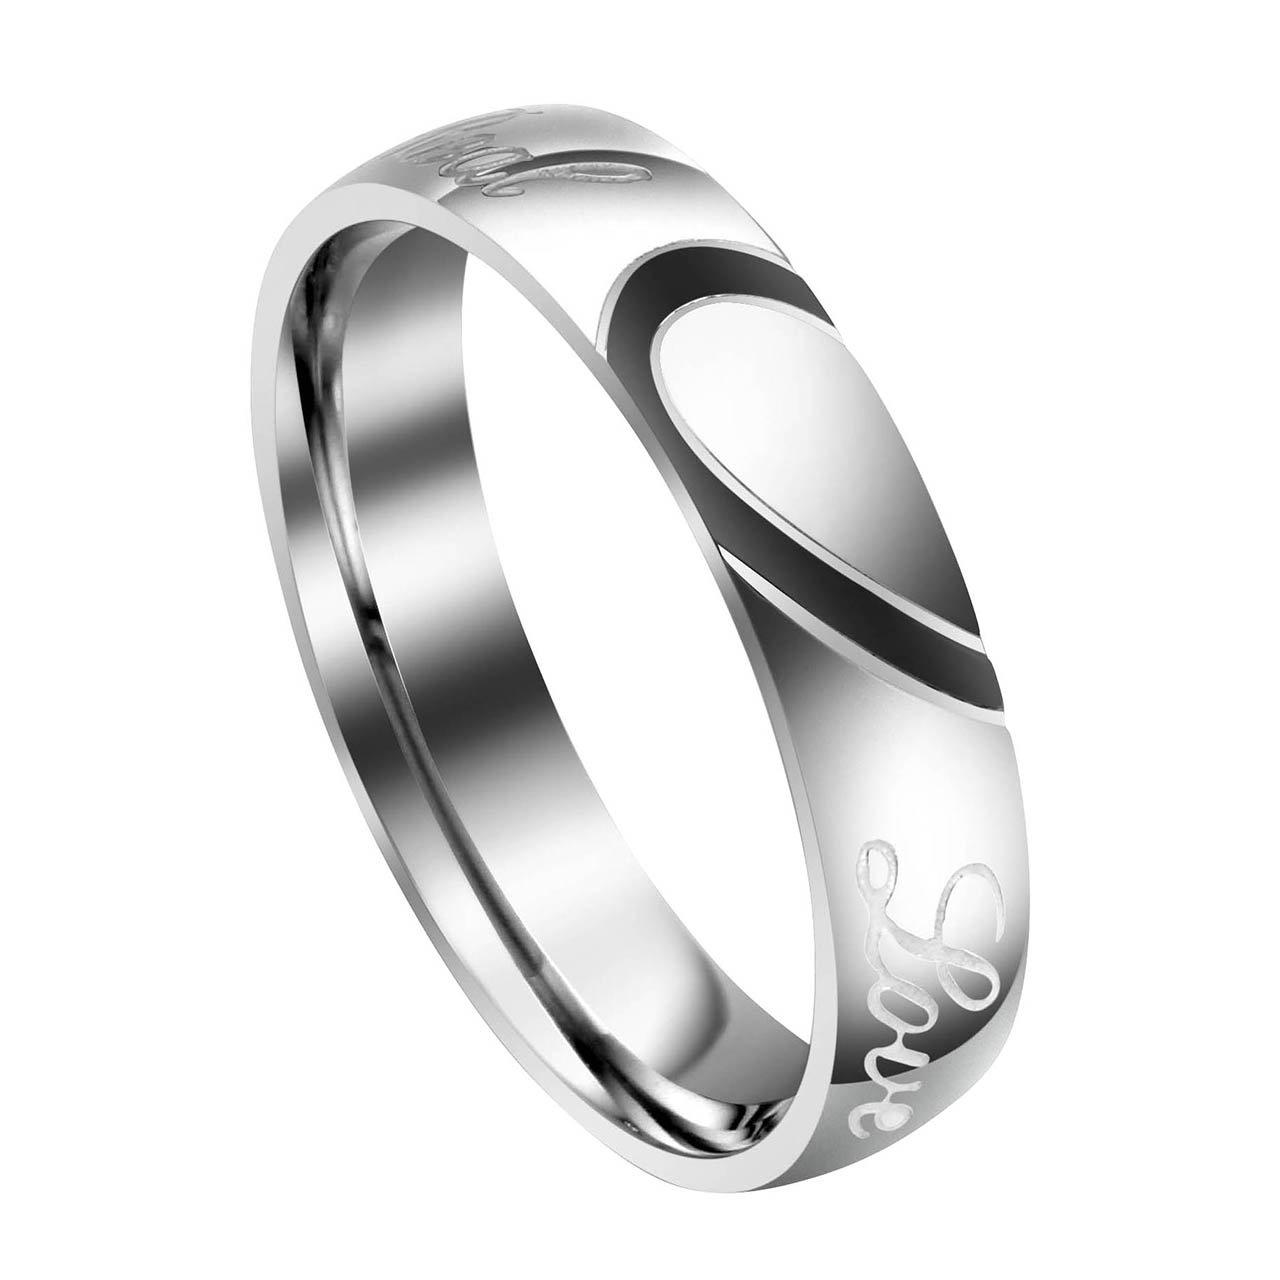 Amazon.com: Jovivi - Anillos personalizados para pareja ...